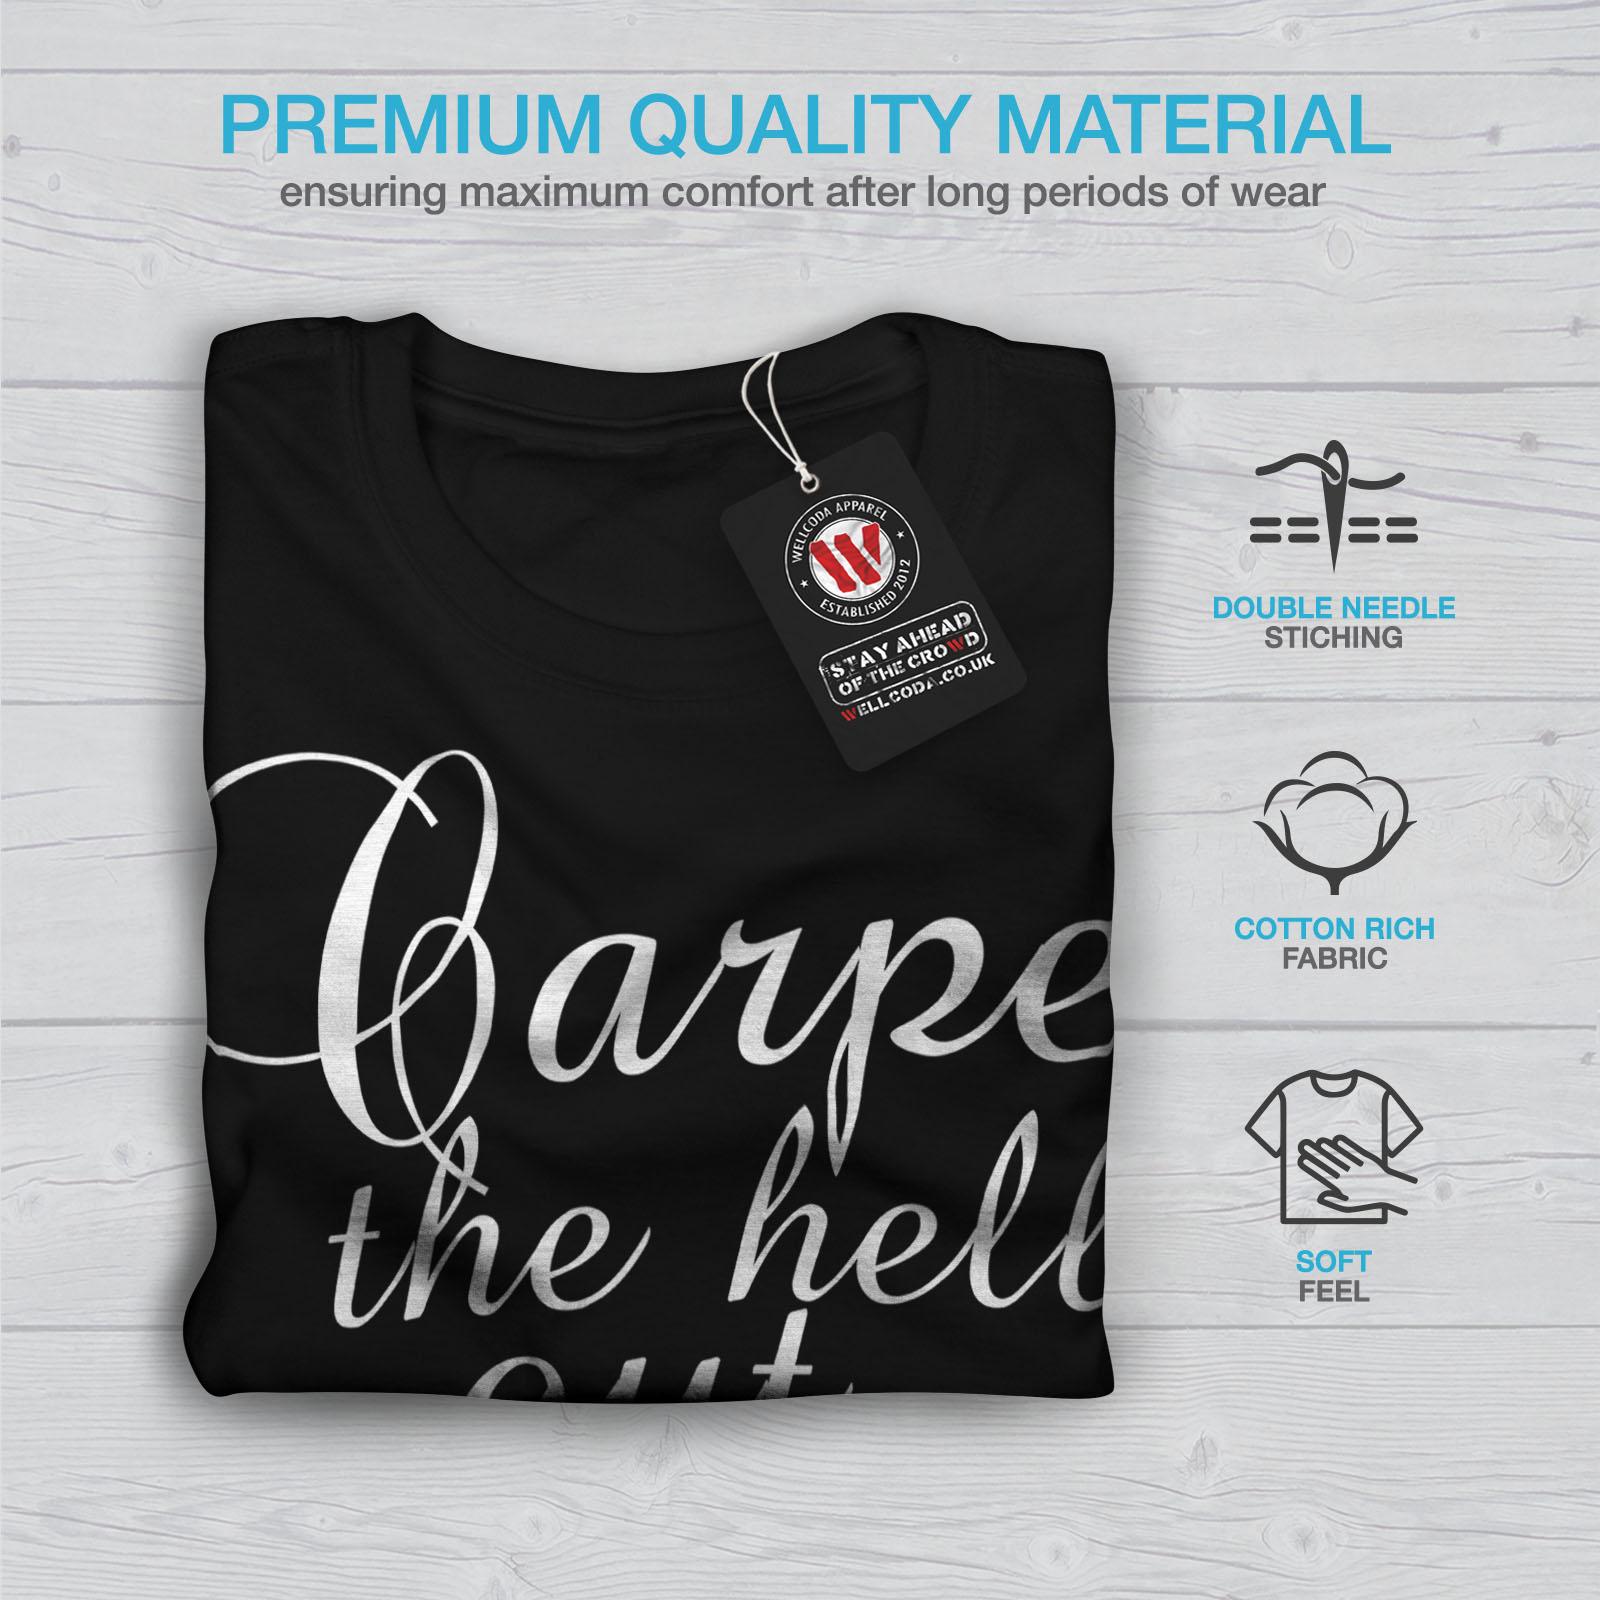 Wellcoda-Carpe-Diem-Herren-T-Shirt-hasse-Zitat-Grafikdesign-Printed-Tee Indexbild 7